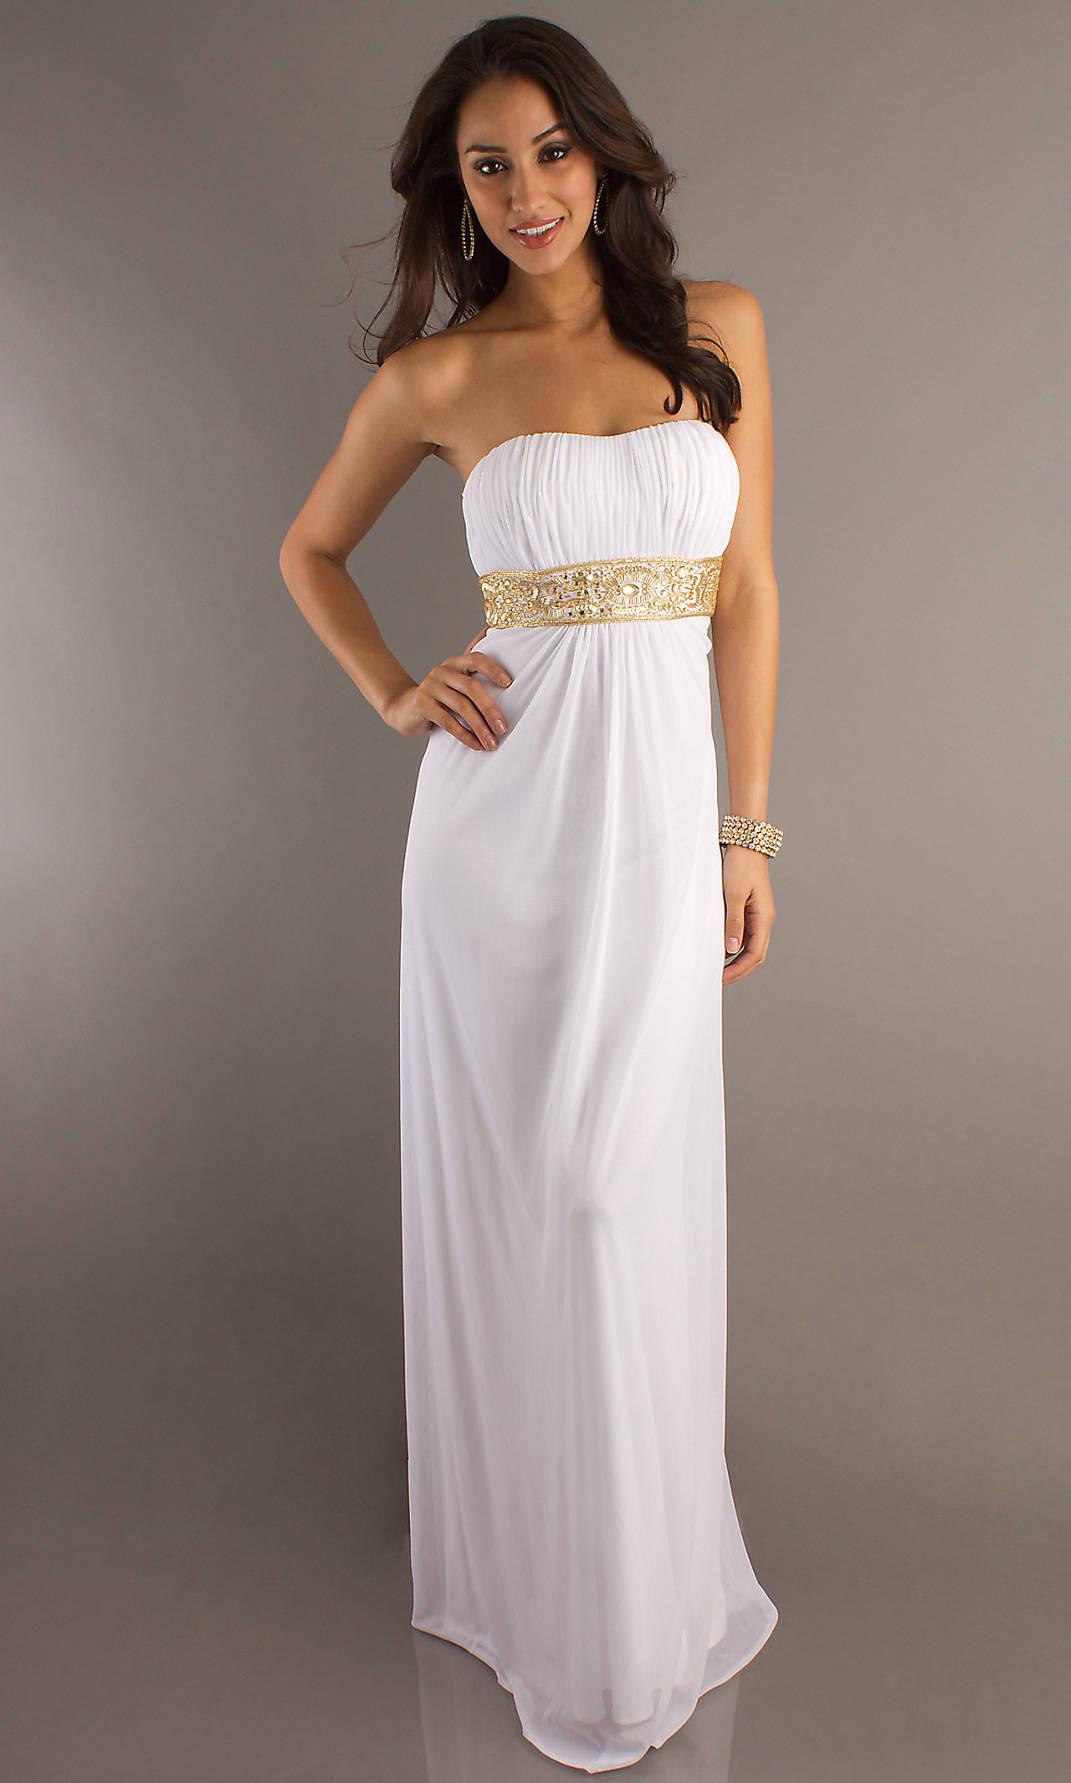 elegant white cocktail dresses photo - 1